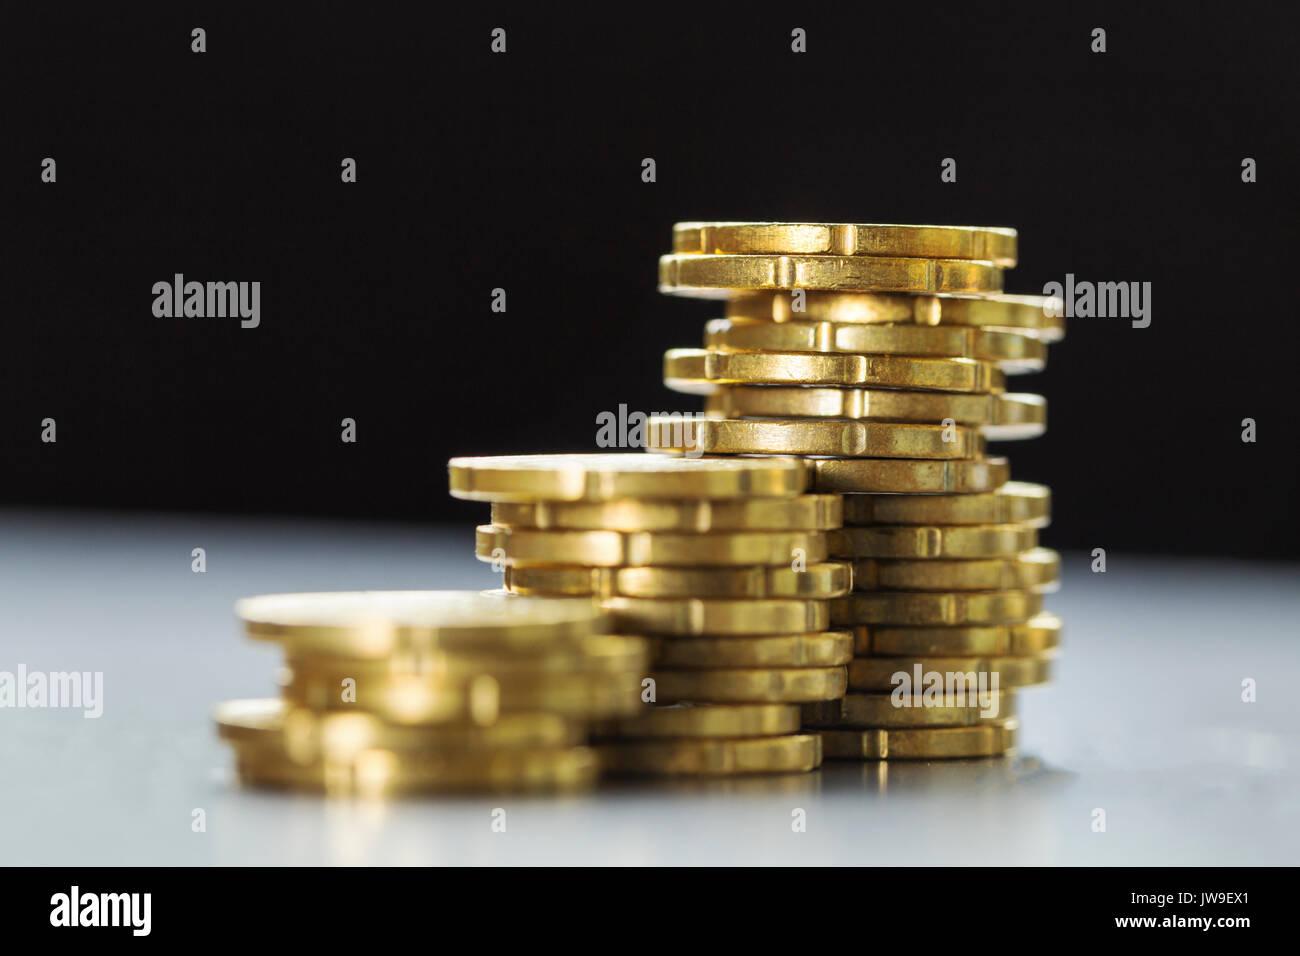 Gold Glänzend 20 Euro Cent Münzen Stockfoto Bild 153258617 Alamy